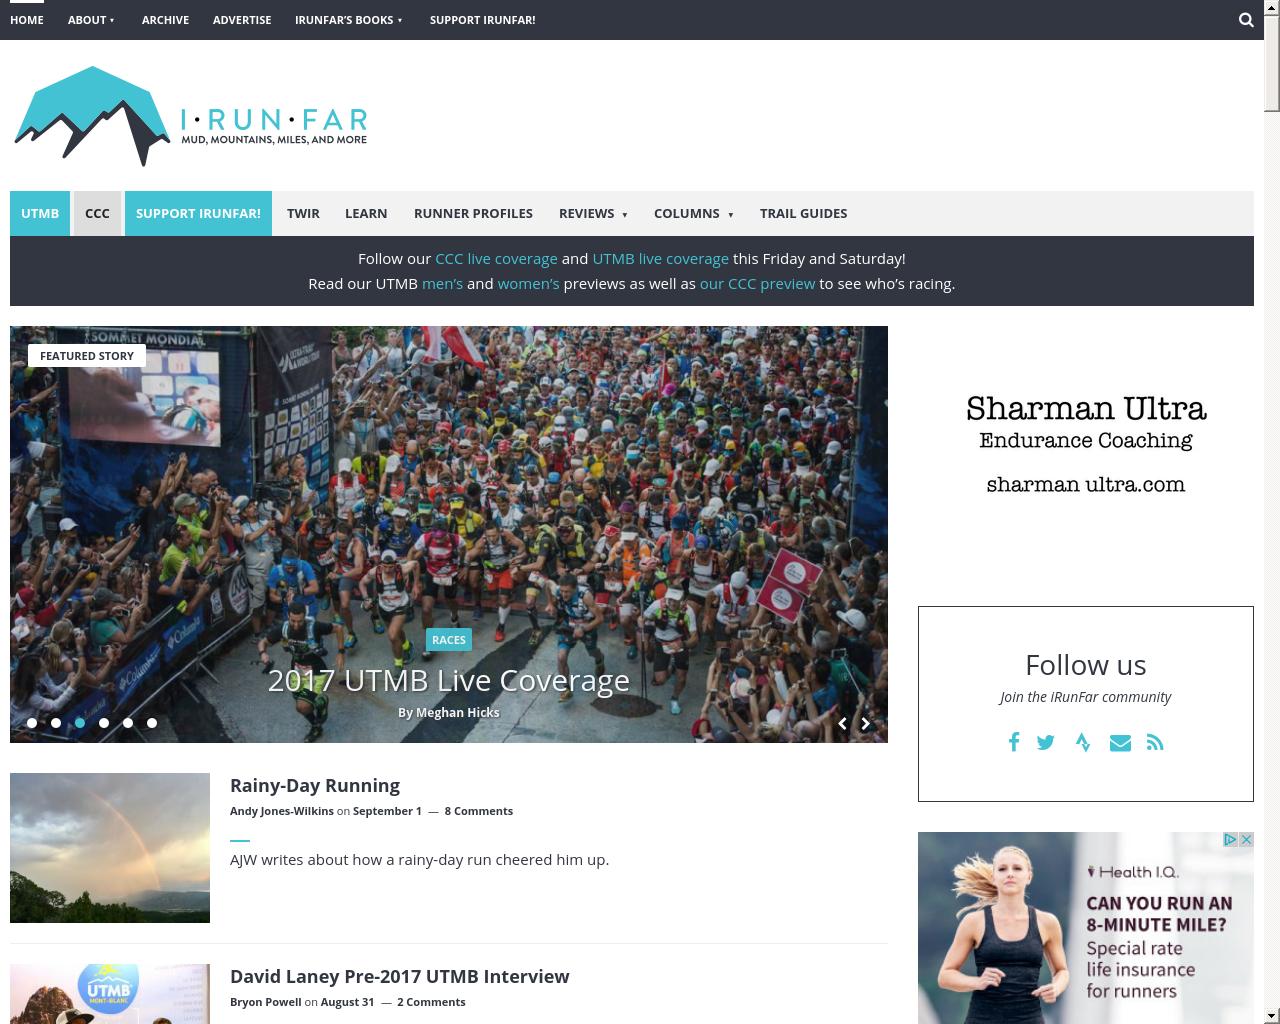 IrunFar-Advertising-Reviews-Pricing